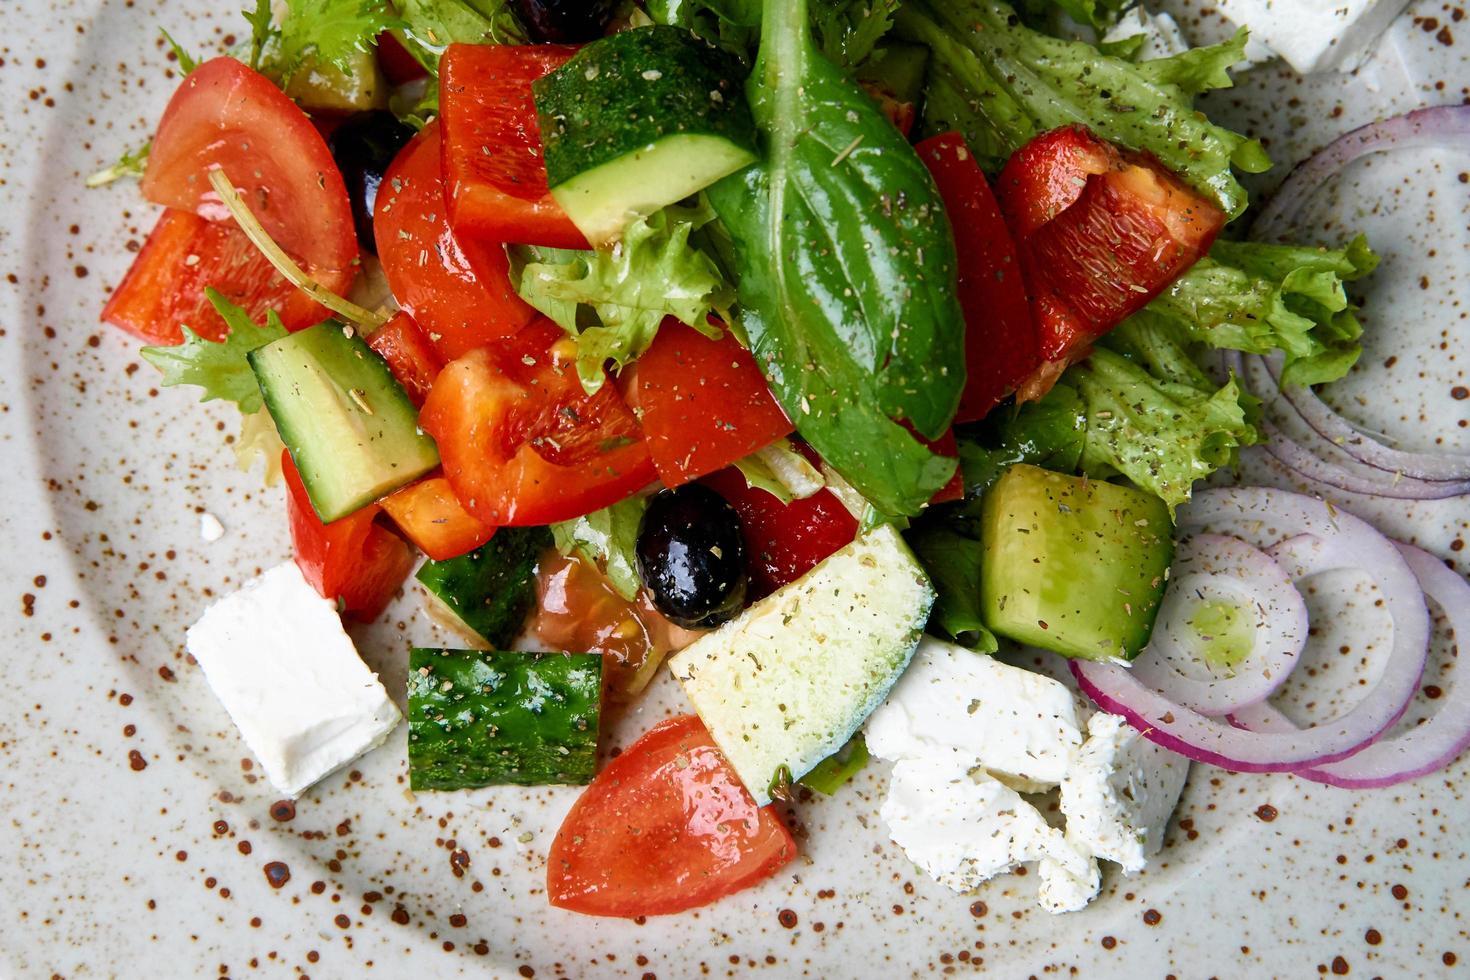 salade mixte saine photo